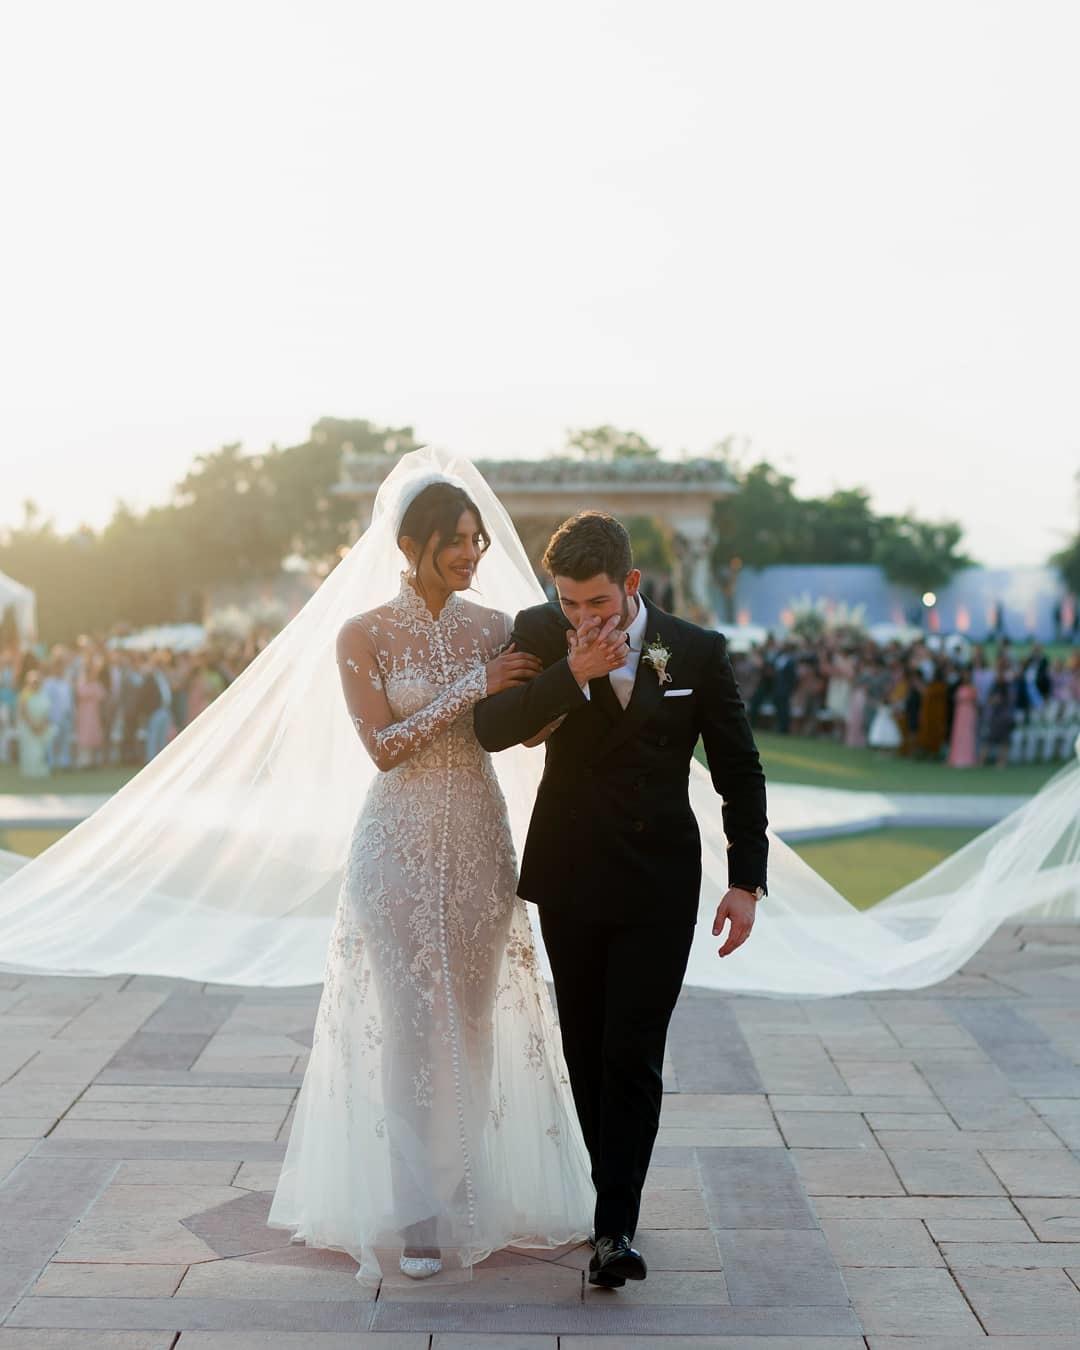 The Christian wedding (Source Instagram)